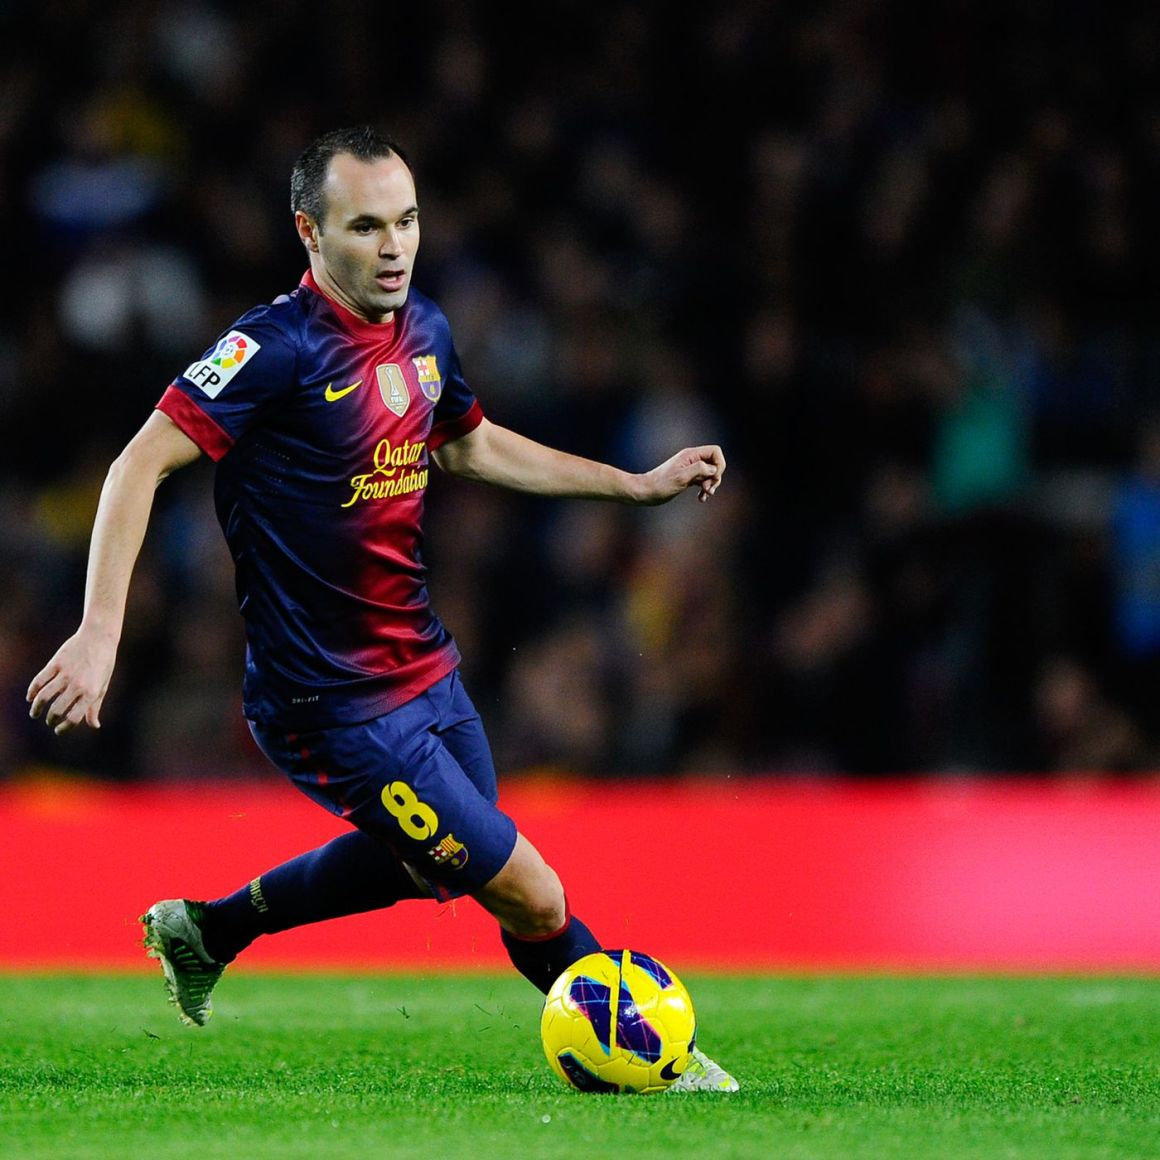 Why Andrés Iniesta should win the 2012 Ballon d'Or - Barca Blaugranes